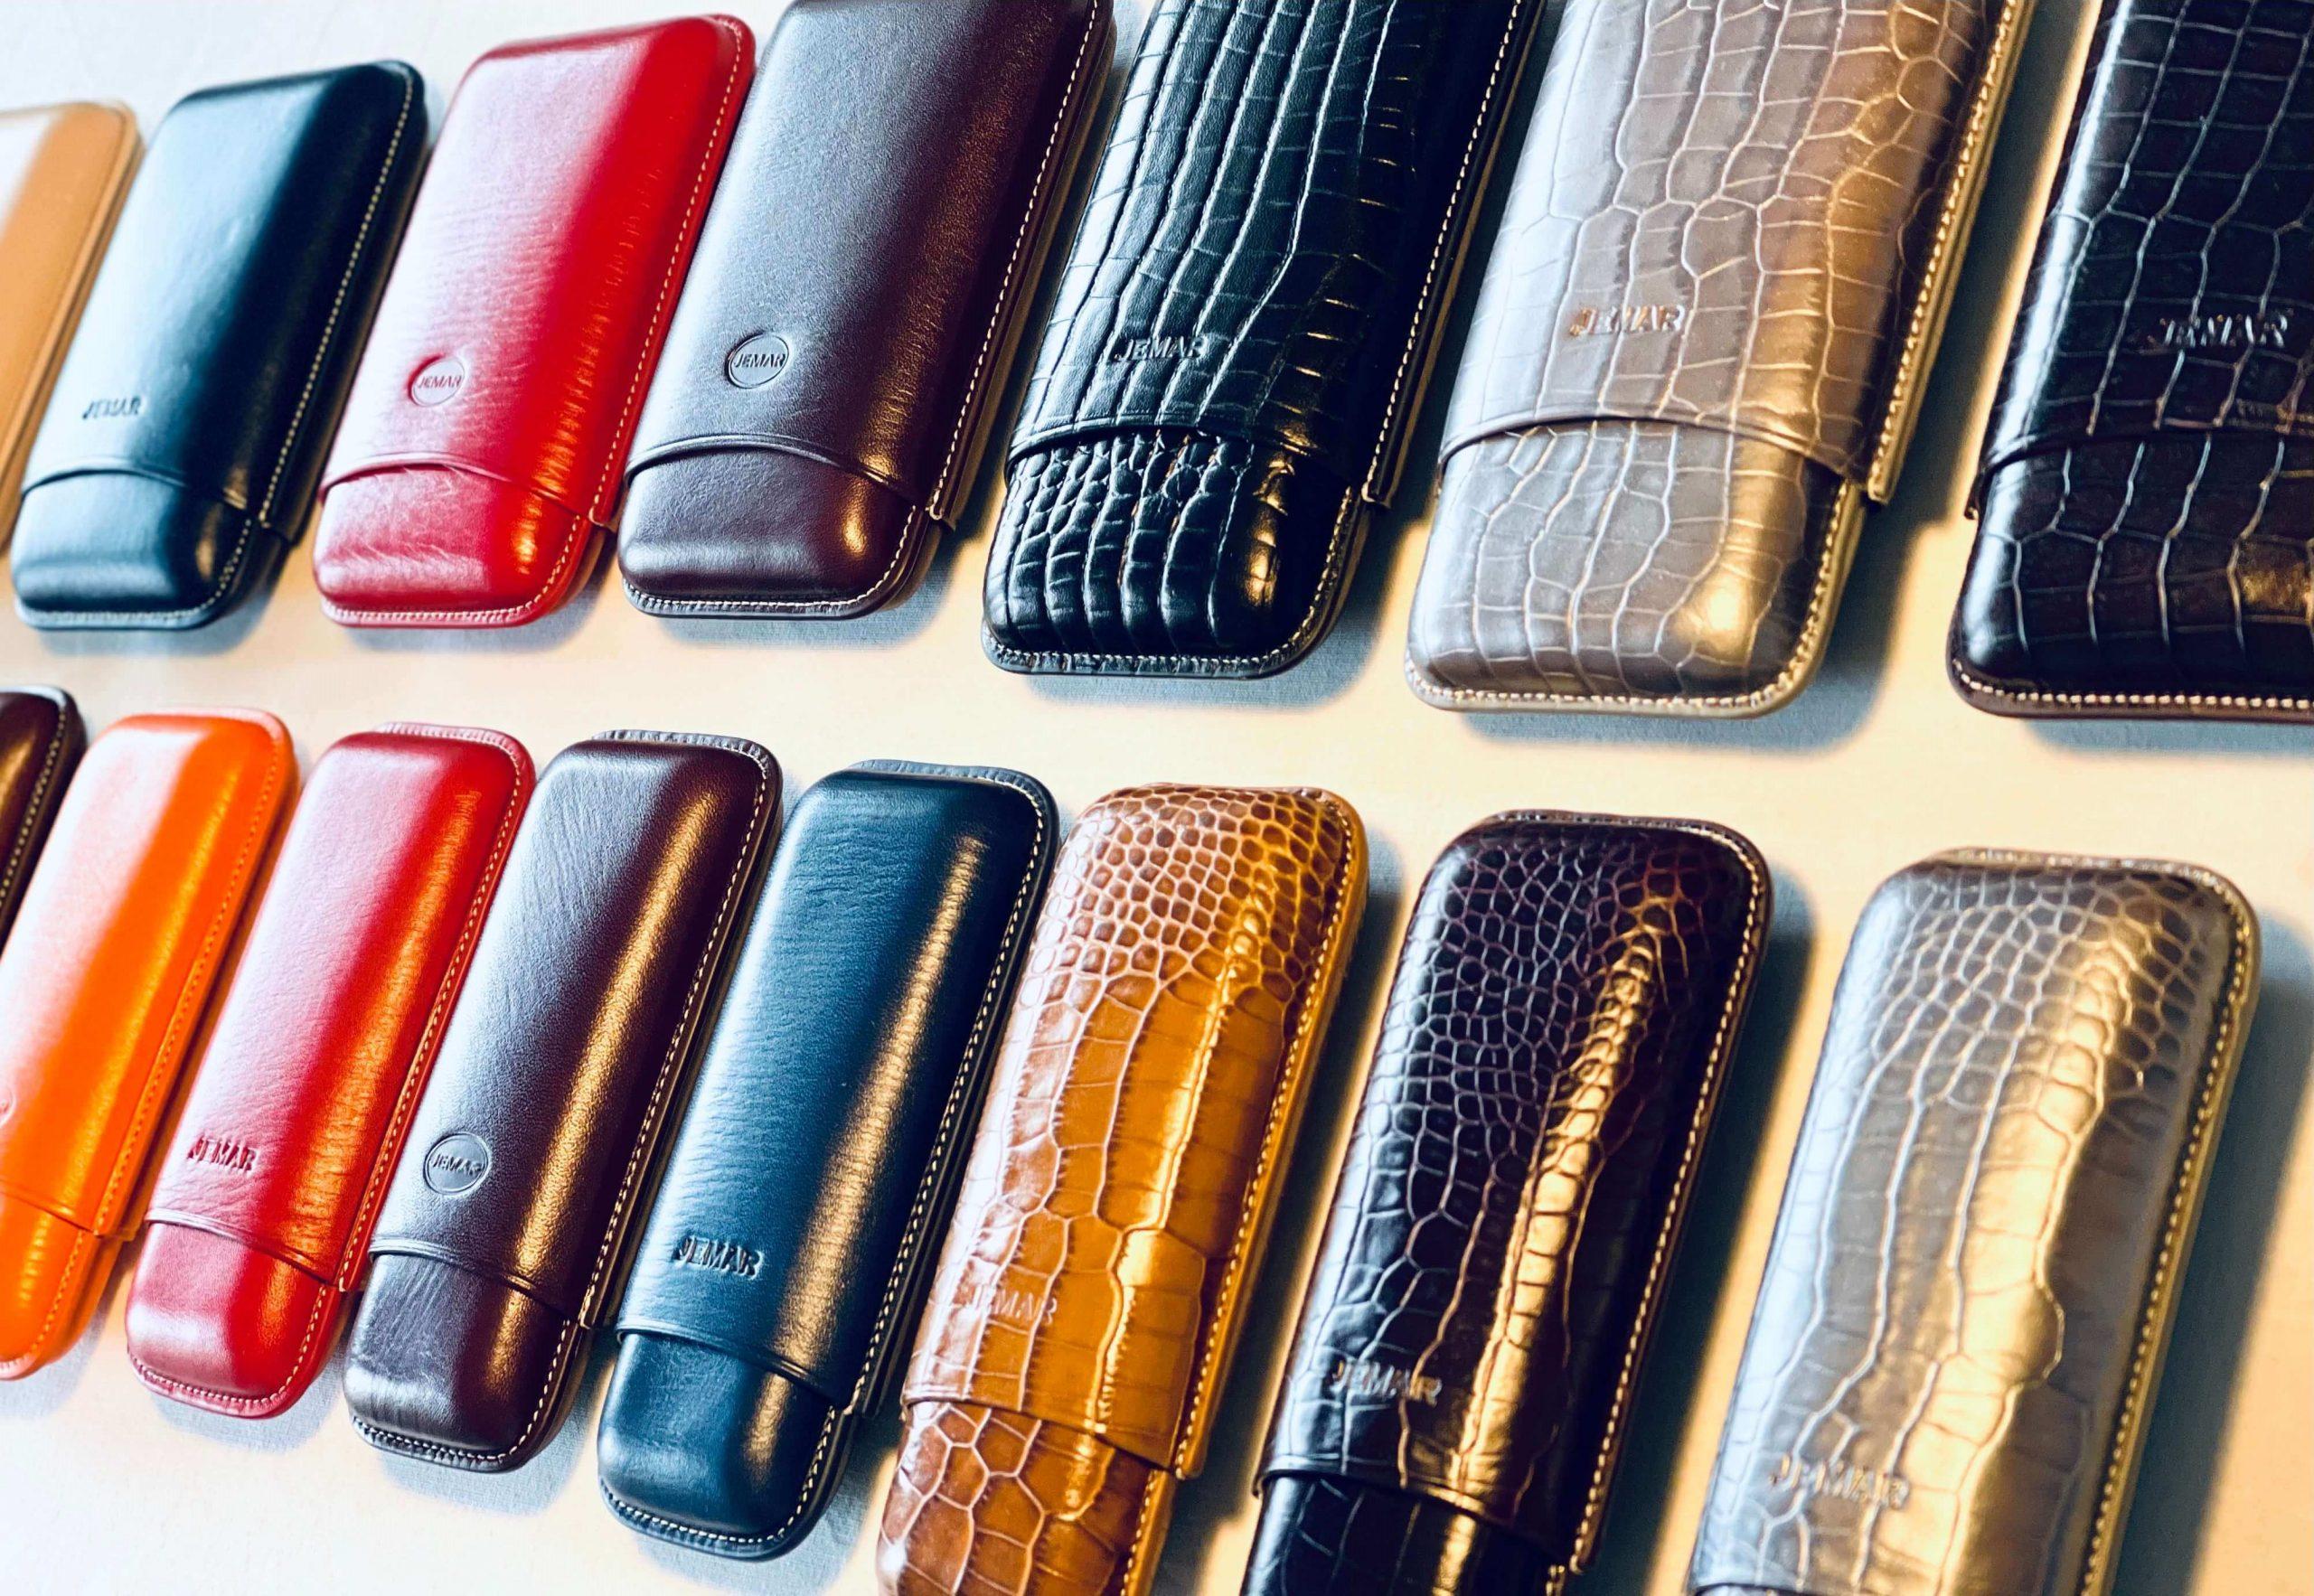 Jemar Cigar Cases 1 1 1 scaled